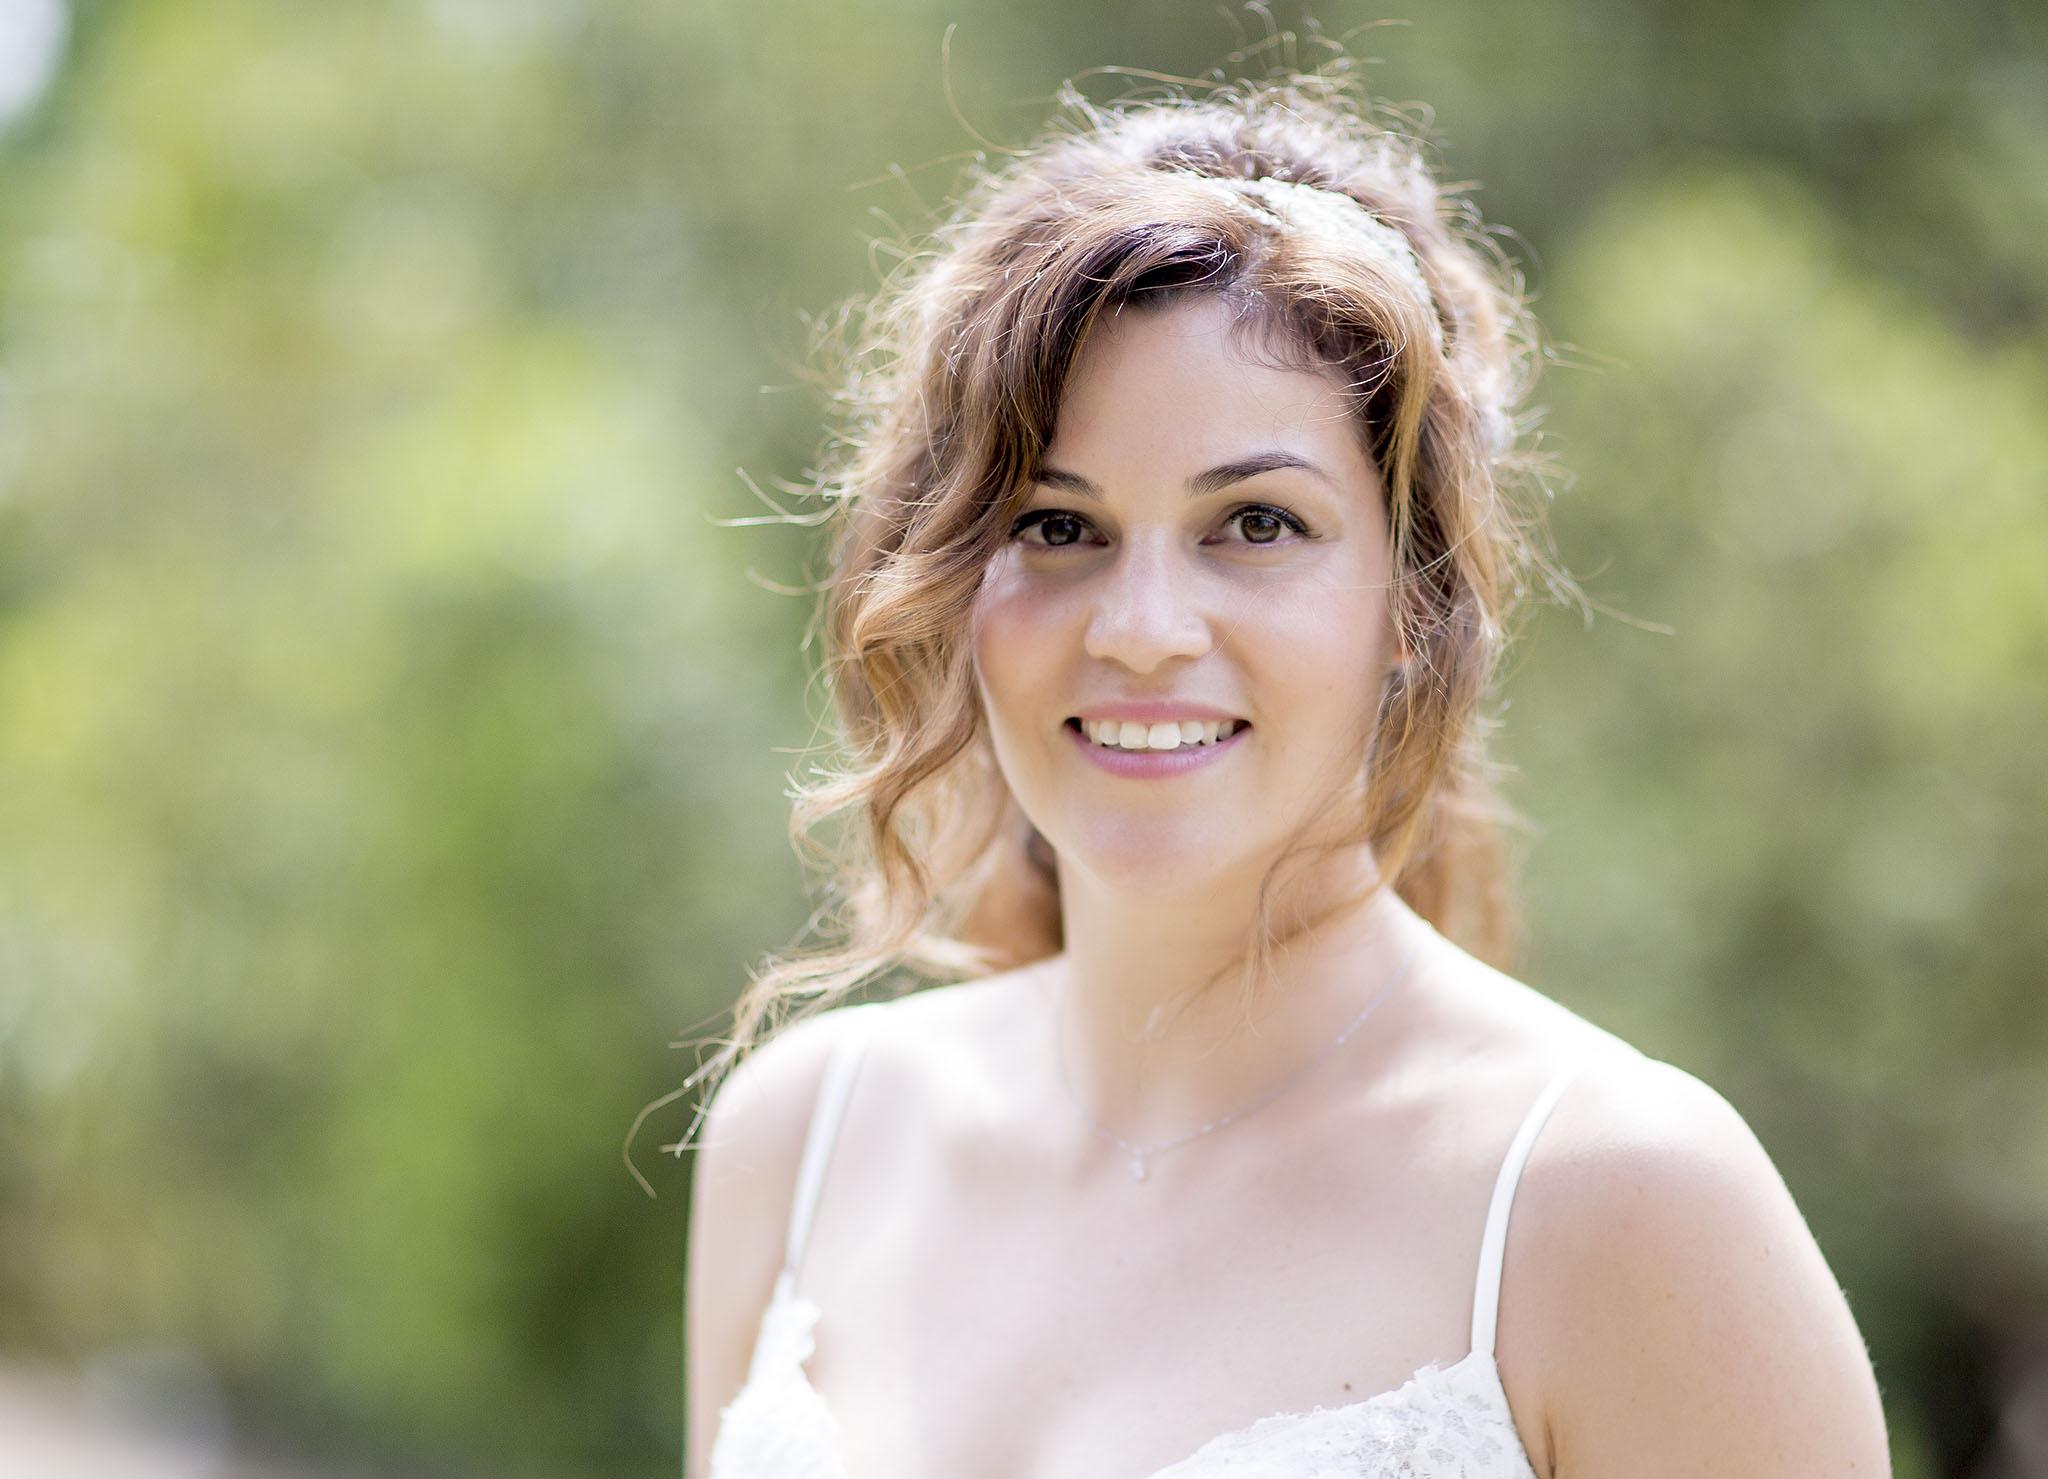 elizabethgphotography_kingslangley_hertfordshire_fineart_wedding_enfield_ricky_nicole_nahlis_39.jpg